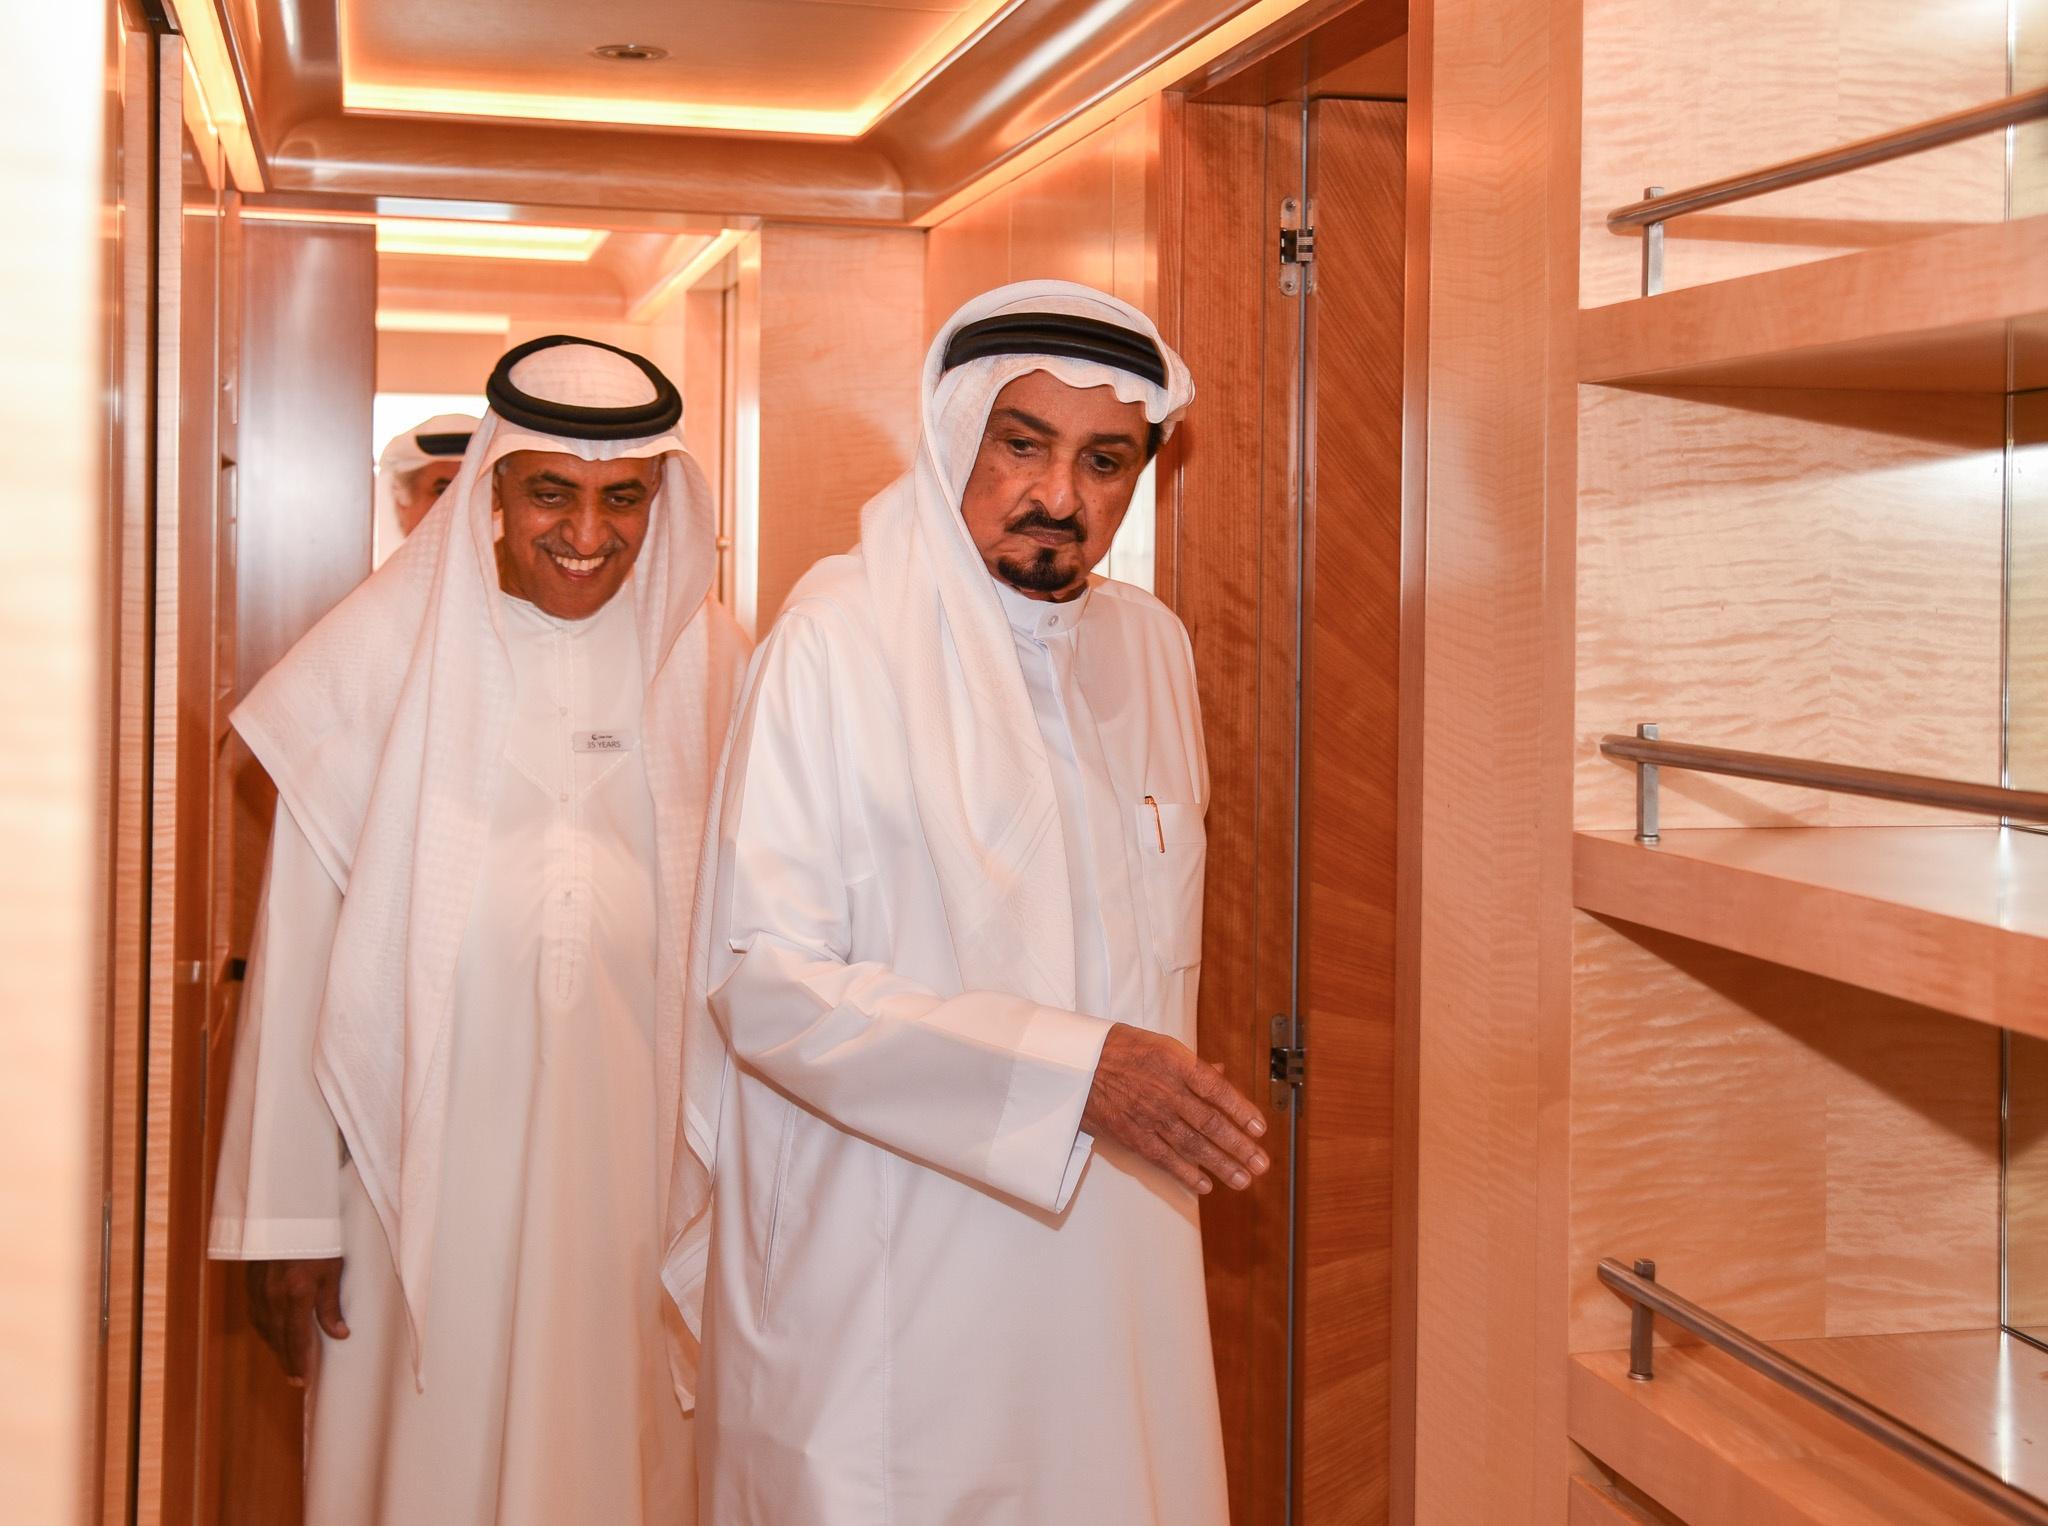 Sheikh Humaid bin Rashid Al Nuaimi (1).jpg